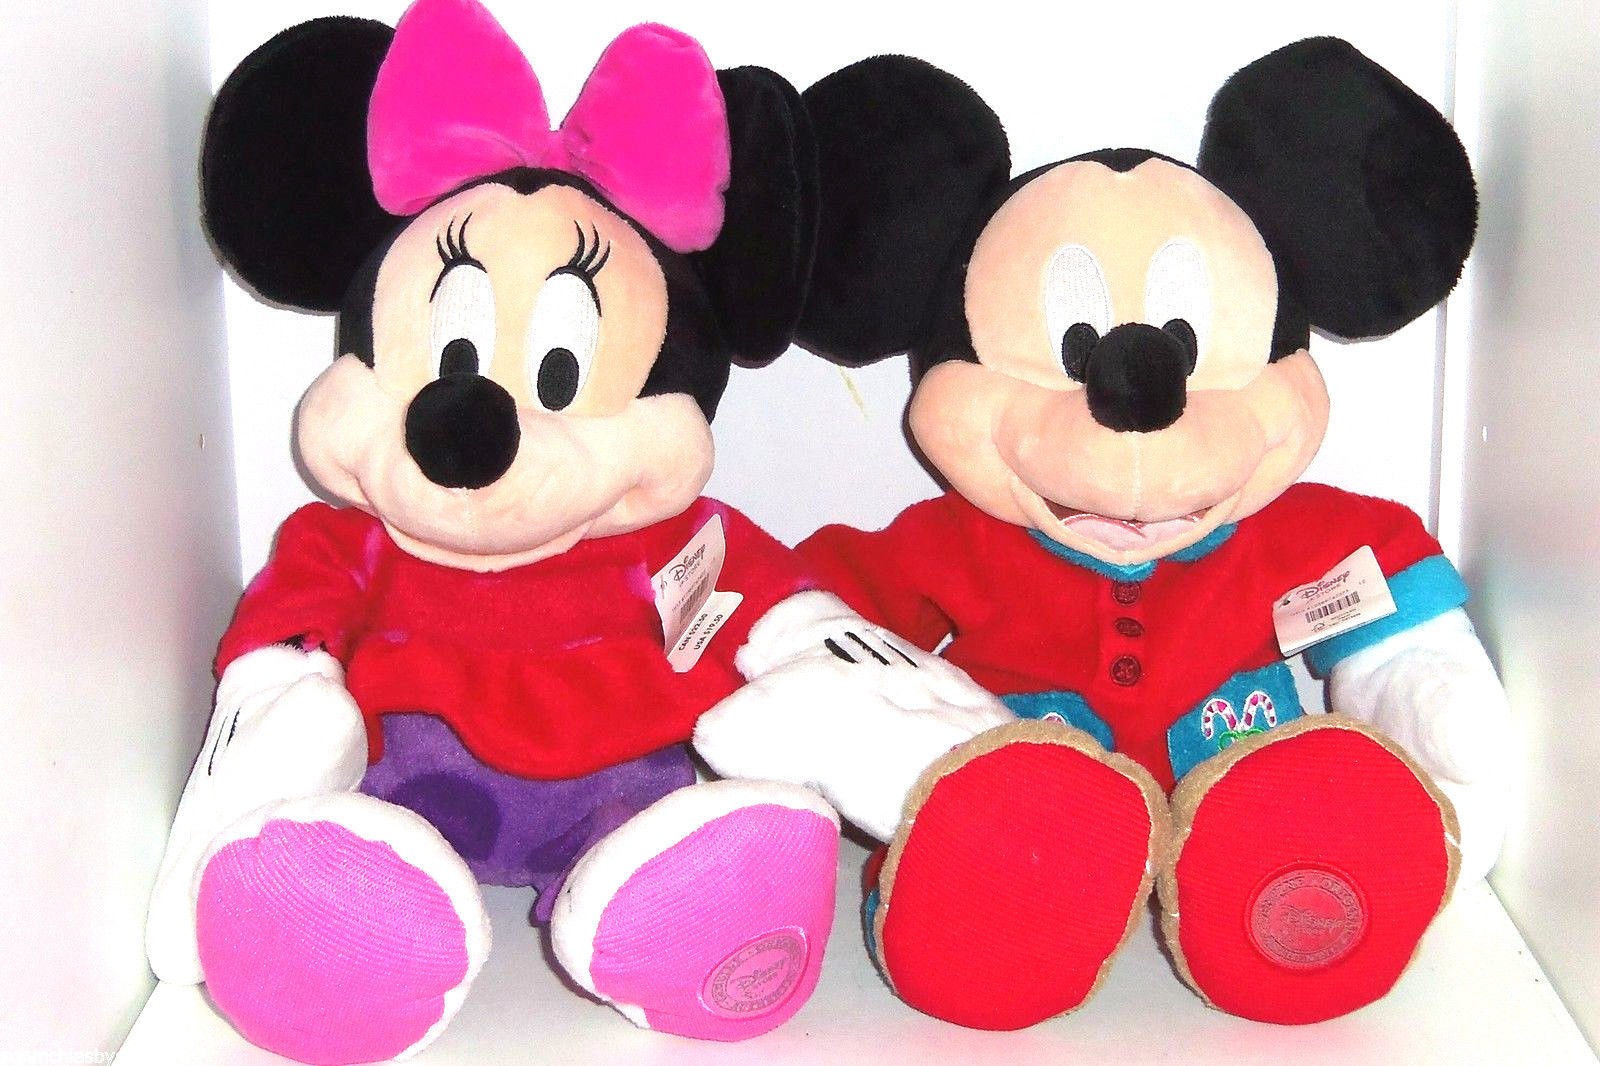 86121fb15c1 Pajama Minnie Mouse Toy Related Keywords   Suggestions - Pajama ...